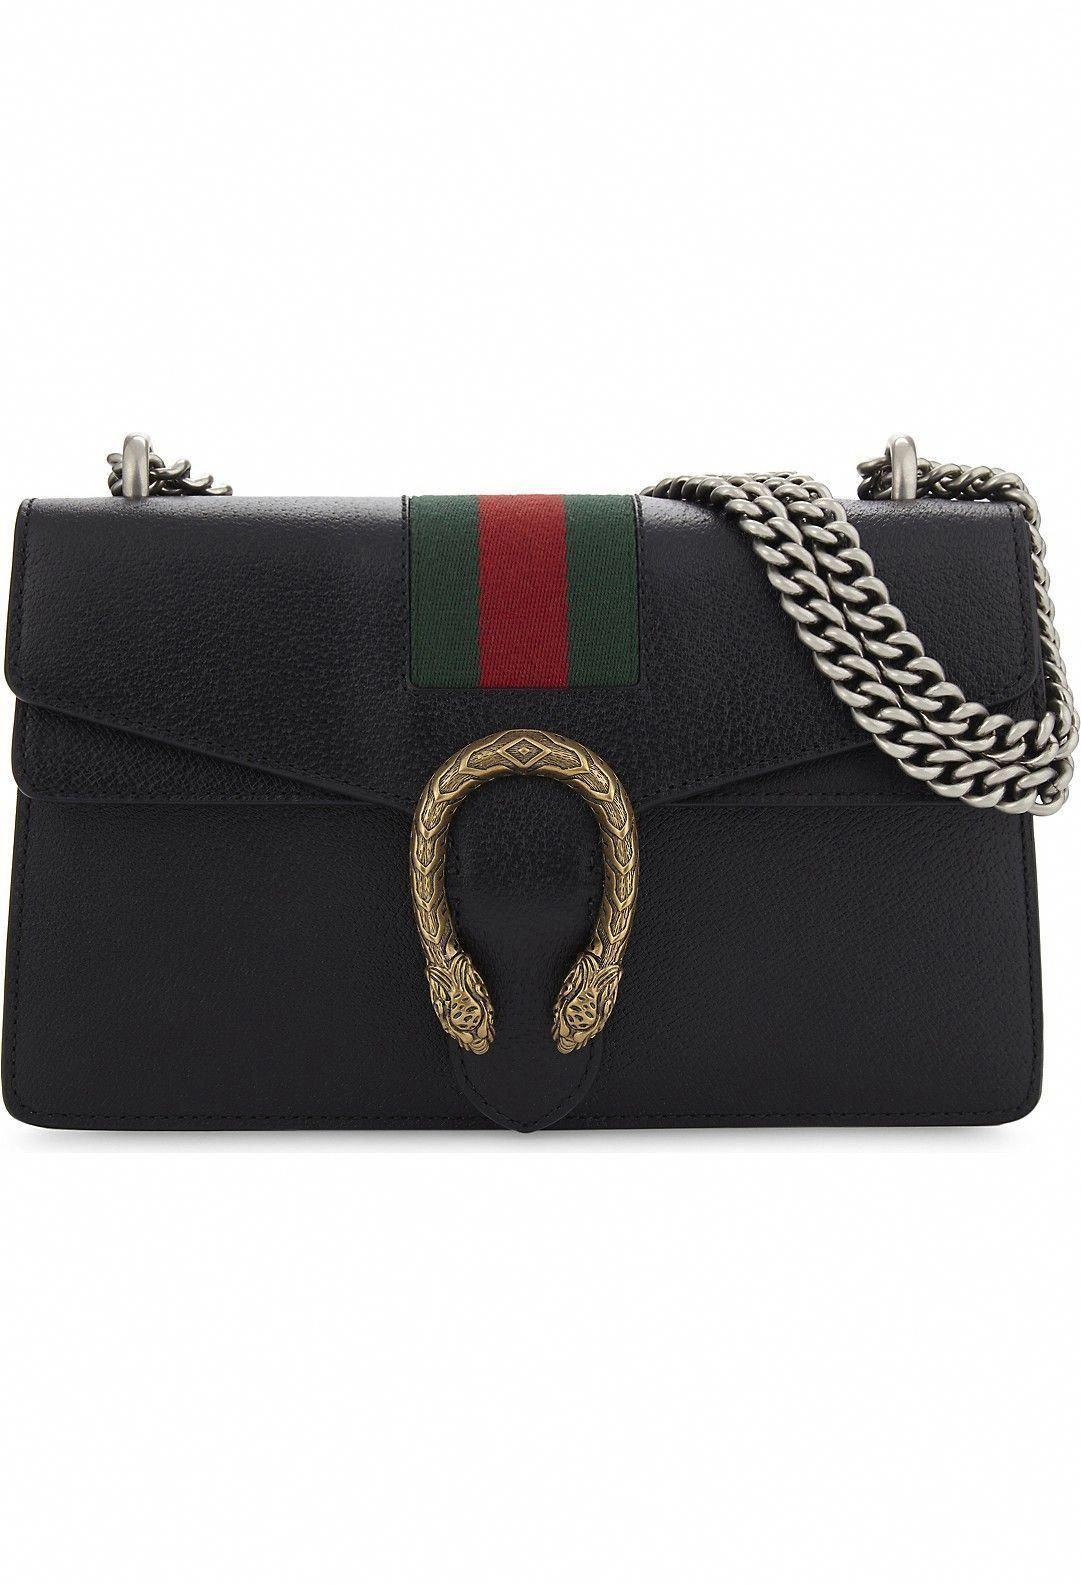 953bd65e7b81 GUCCI - Dionysus web stripe small leather shoulder bag | Selfridges.com  #Guccihandbags